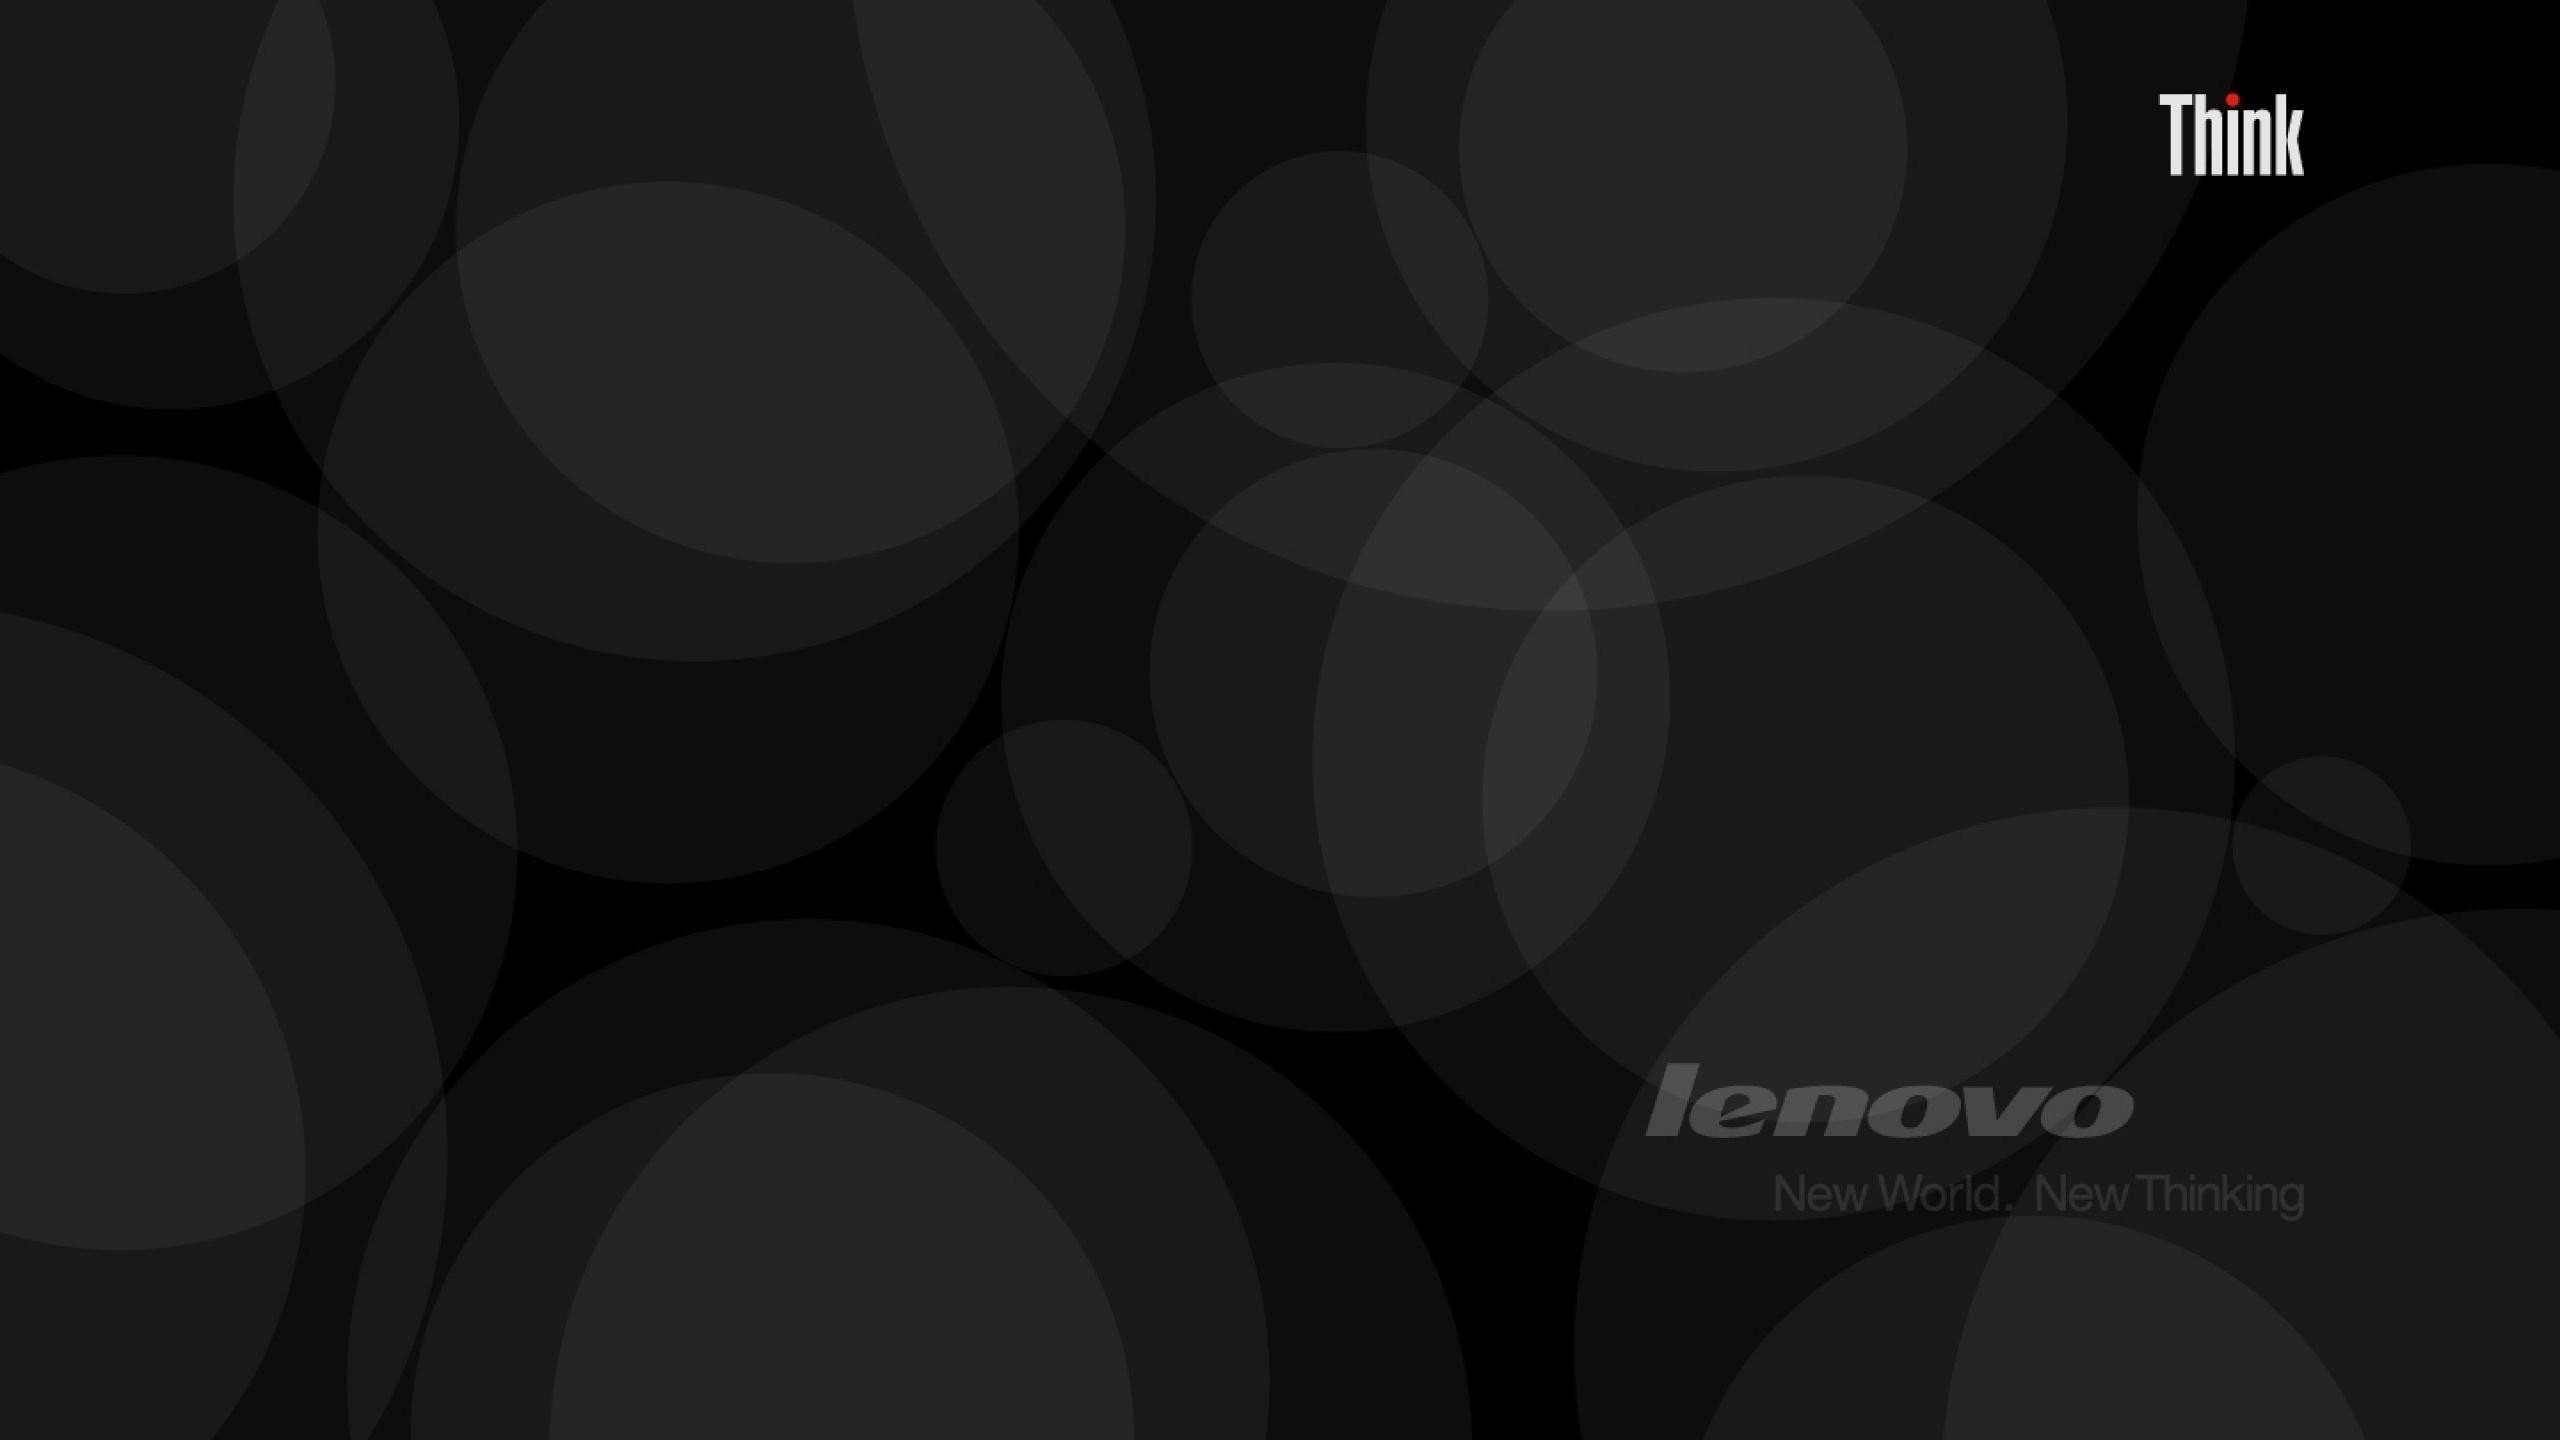 lenovo thinkpad wallpapers yoga legion wiki pixelstalk laptop desktop backgrounds netbook pic mobile yellow getwallpapers